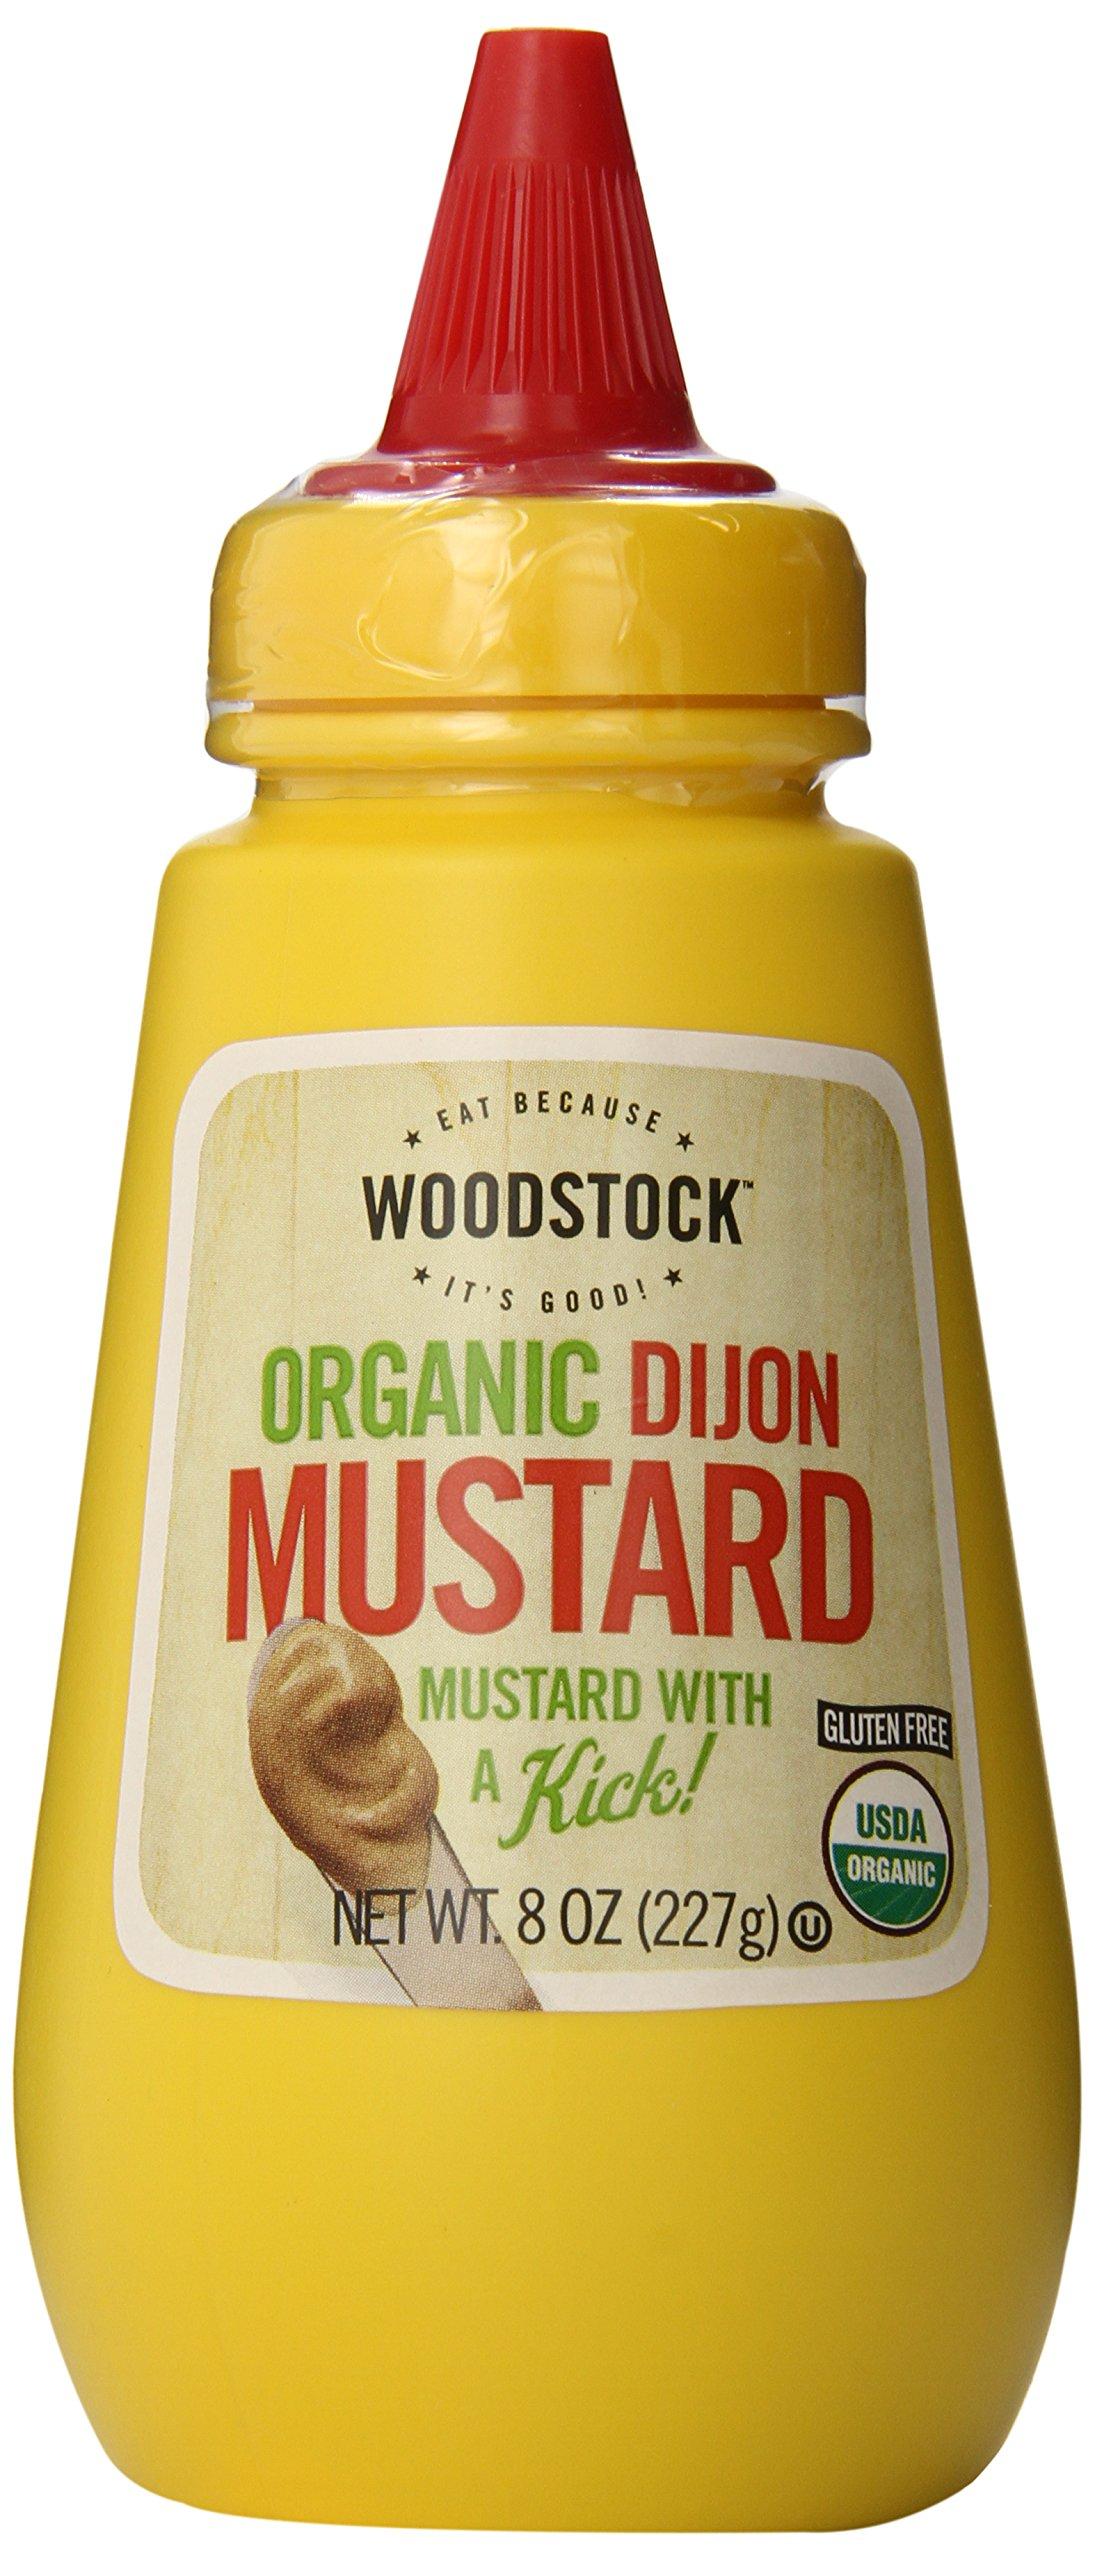 Woodstock Organic Dijon Mustard, 8 Ounce (Pack of 12)